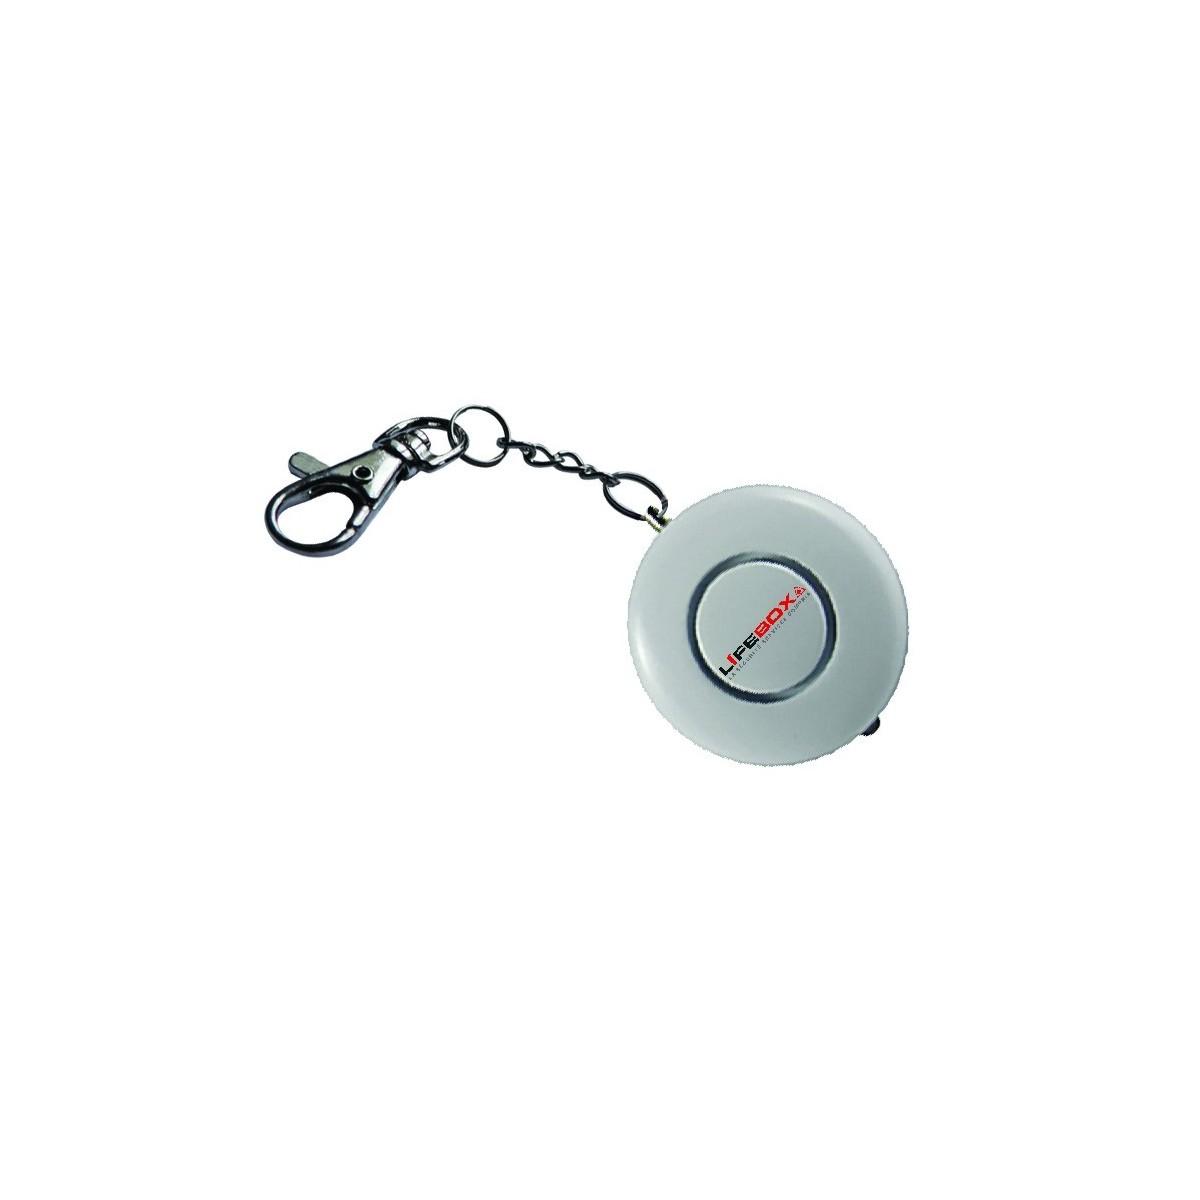 Alarme portable anti agression